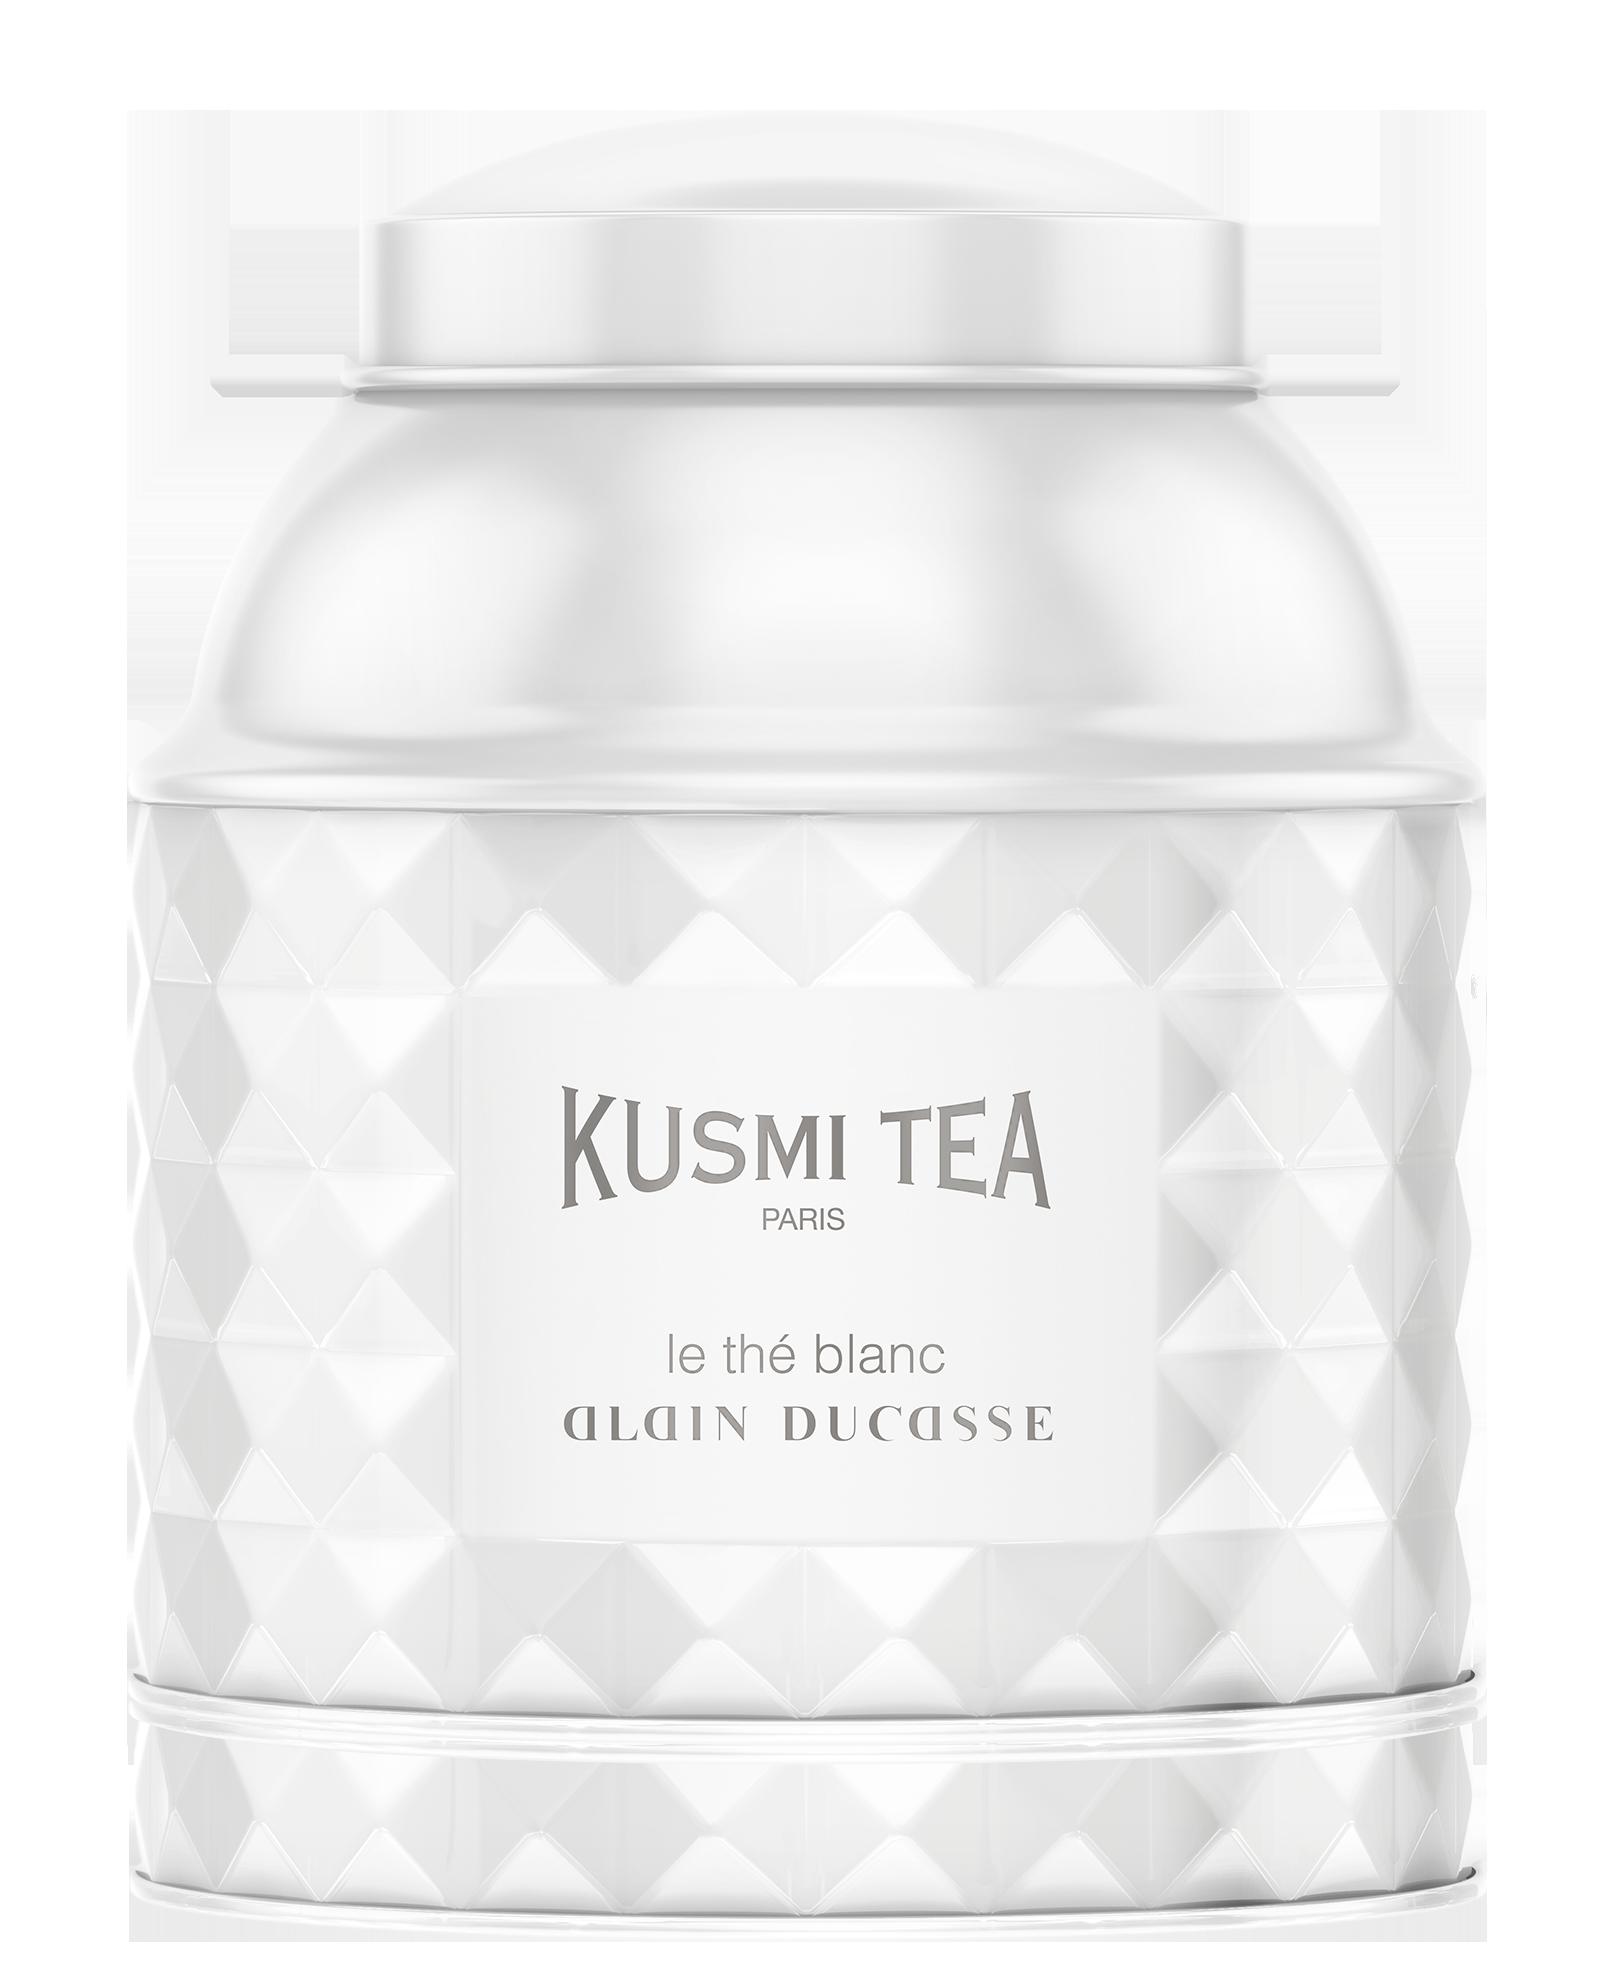 Thé blanc - Le Thé Blanc Alain Ducasse - Vrac - Kusmi Tea